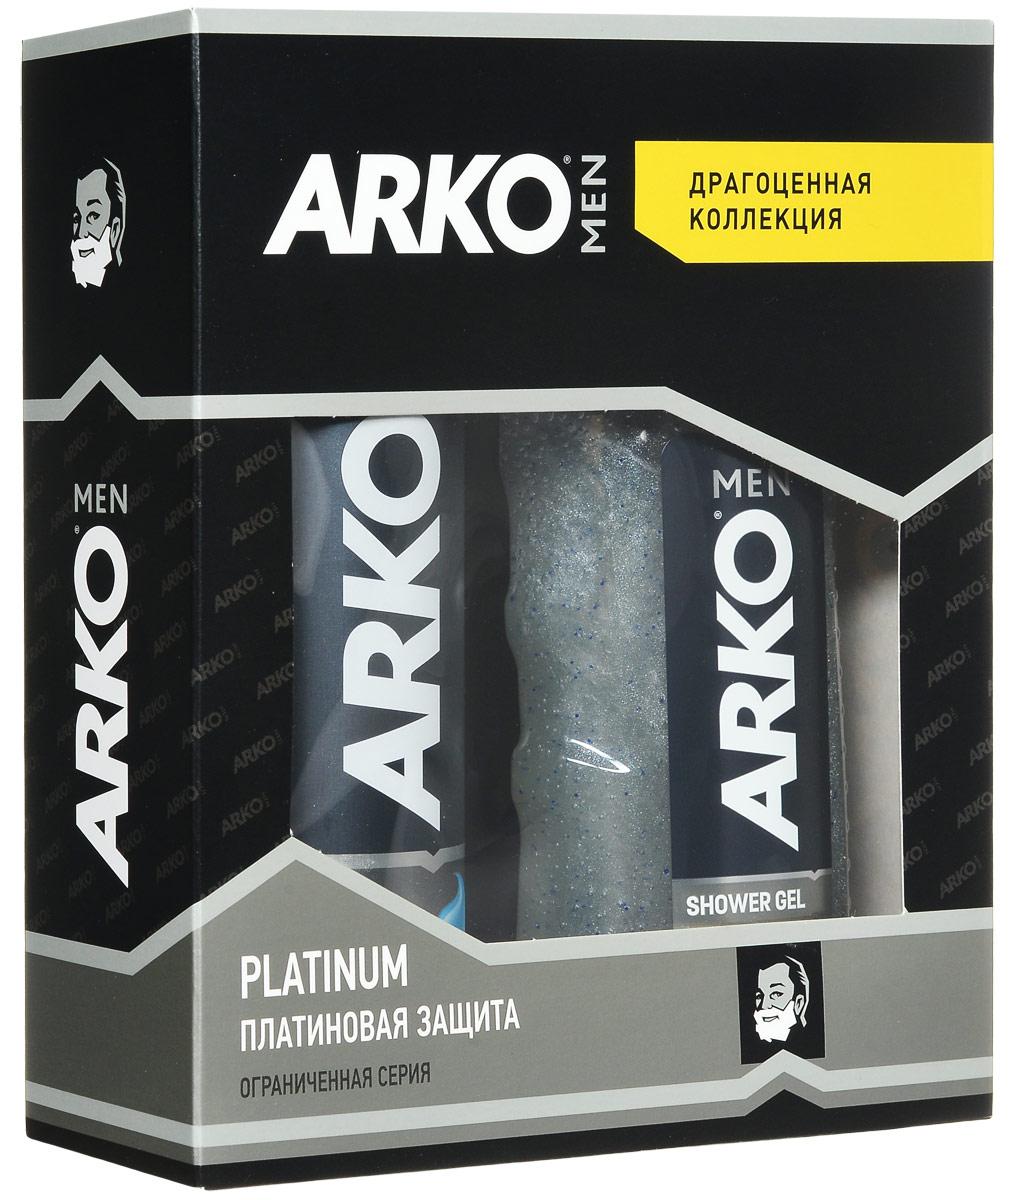 Arko Platinum: ГЕЛЬ 200мл+ГЕЛЬ для душа 250мл